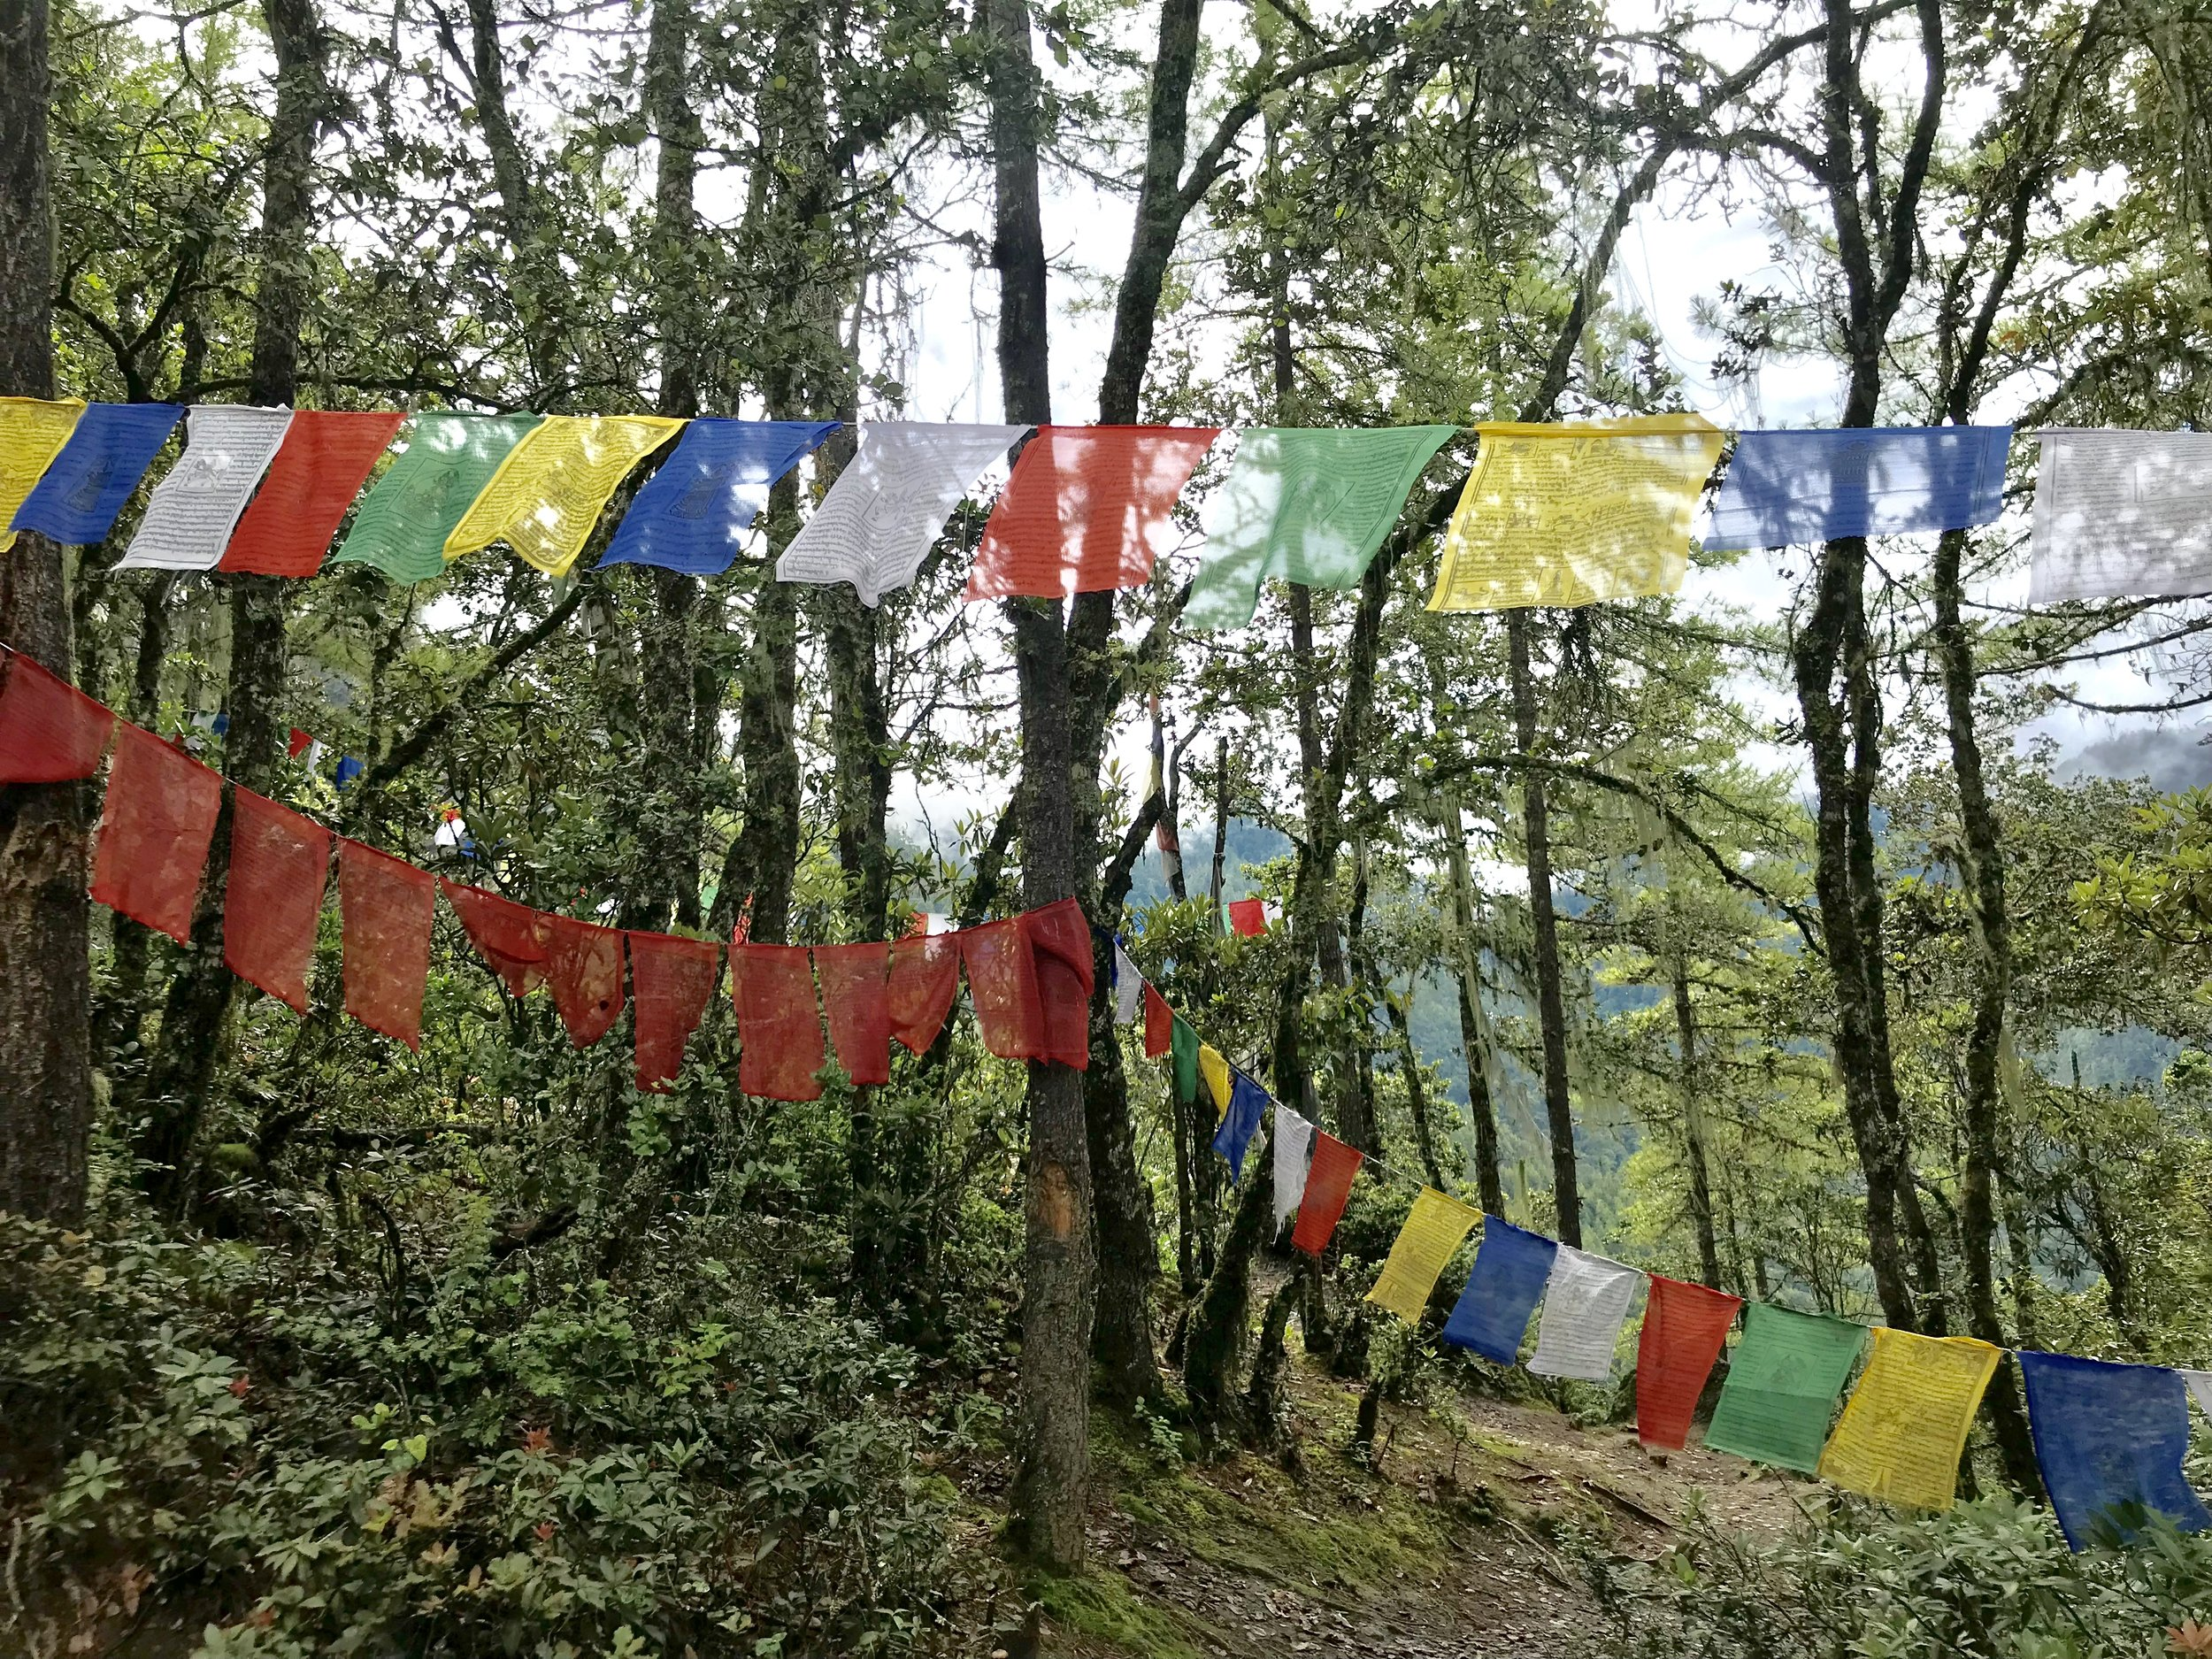 Image author's own, Paro. Bhutan.